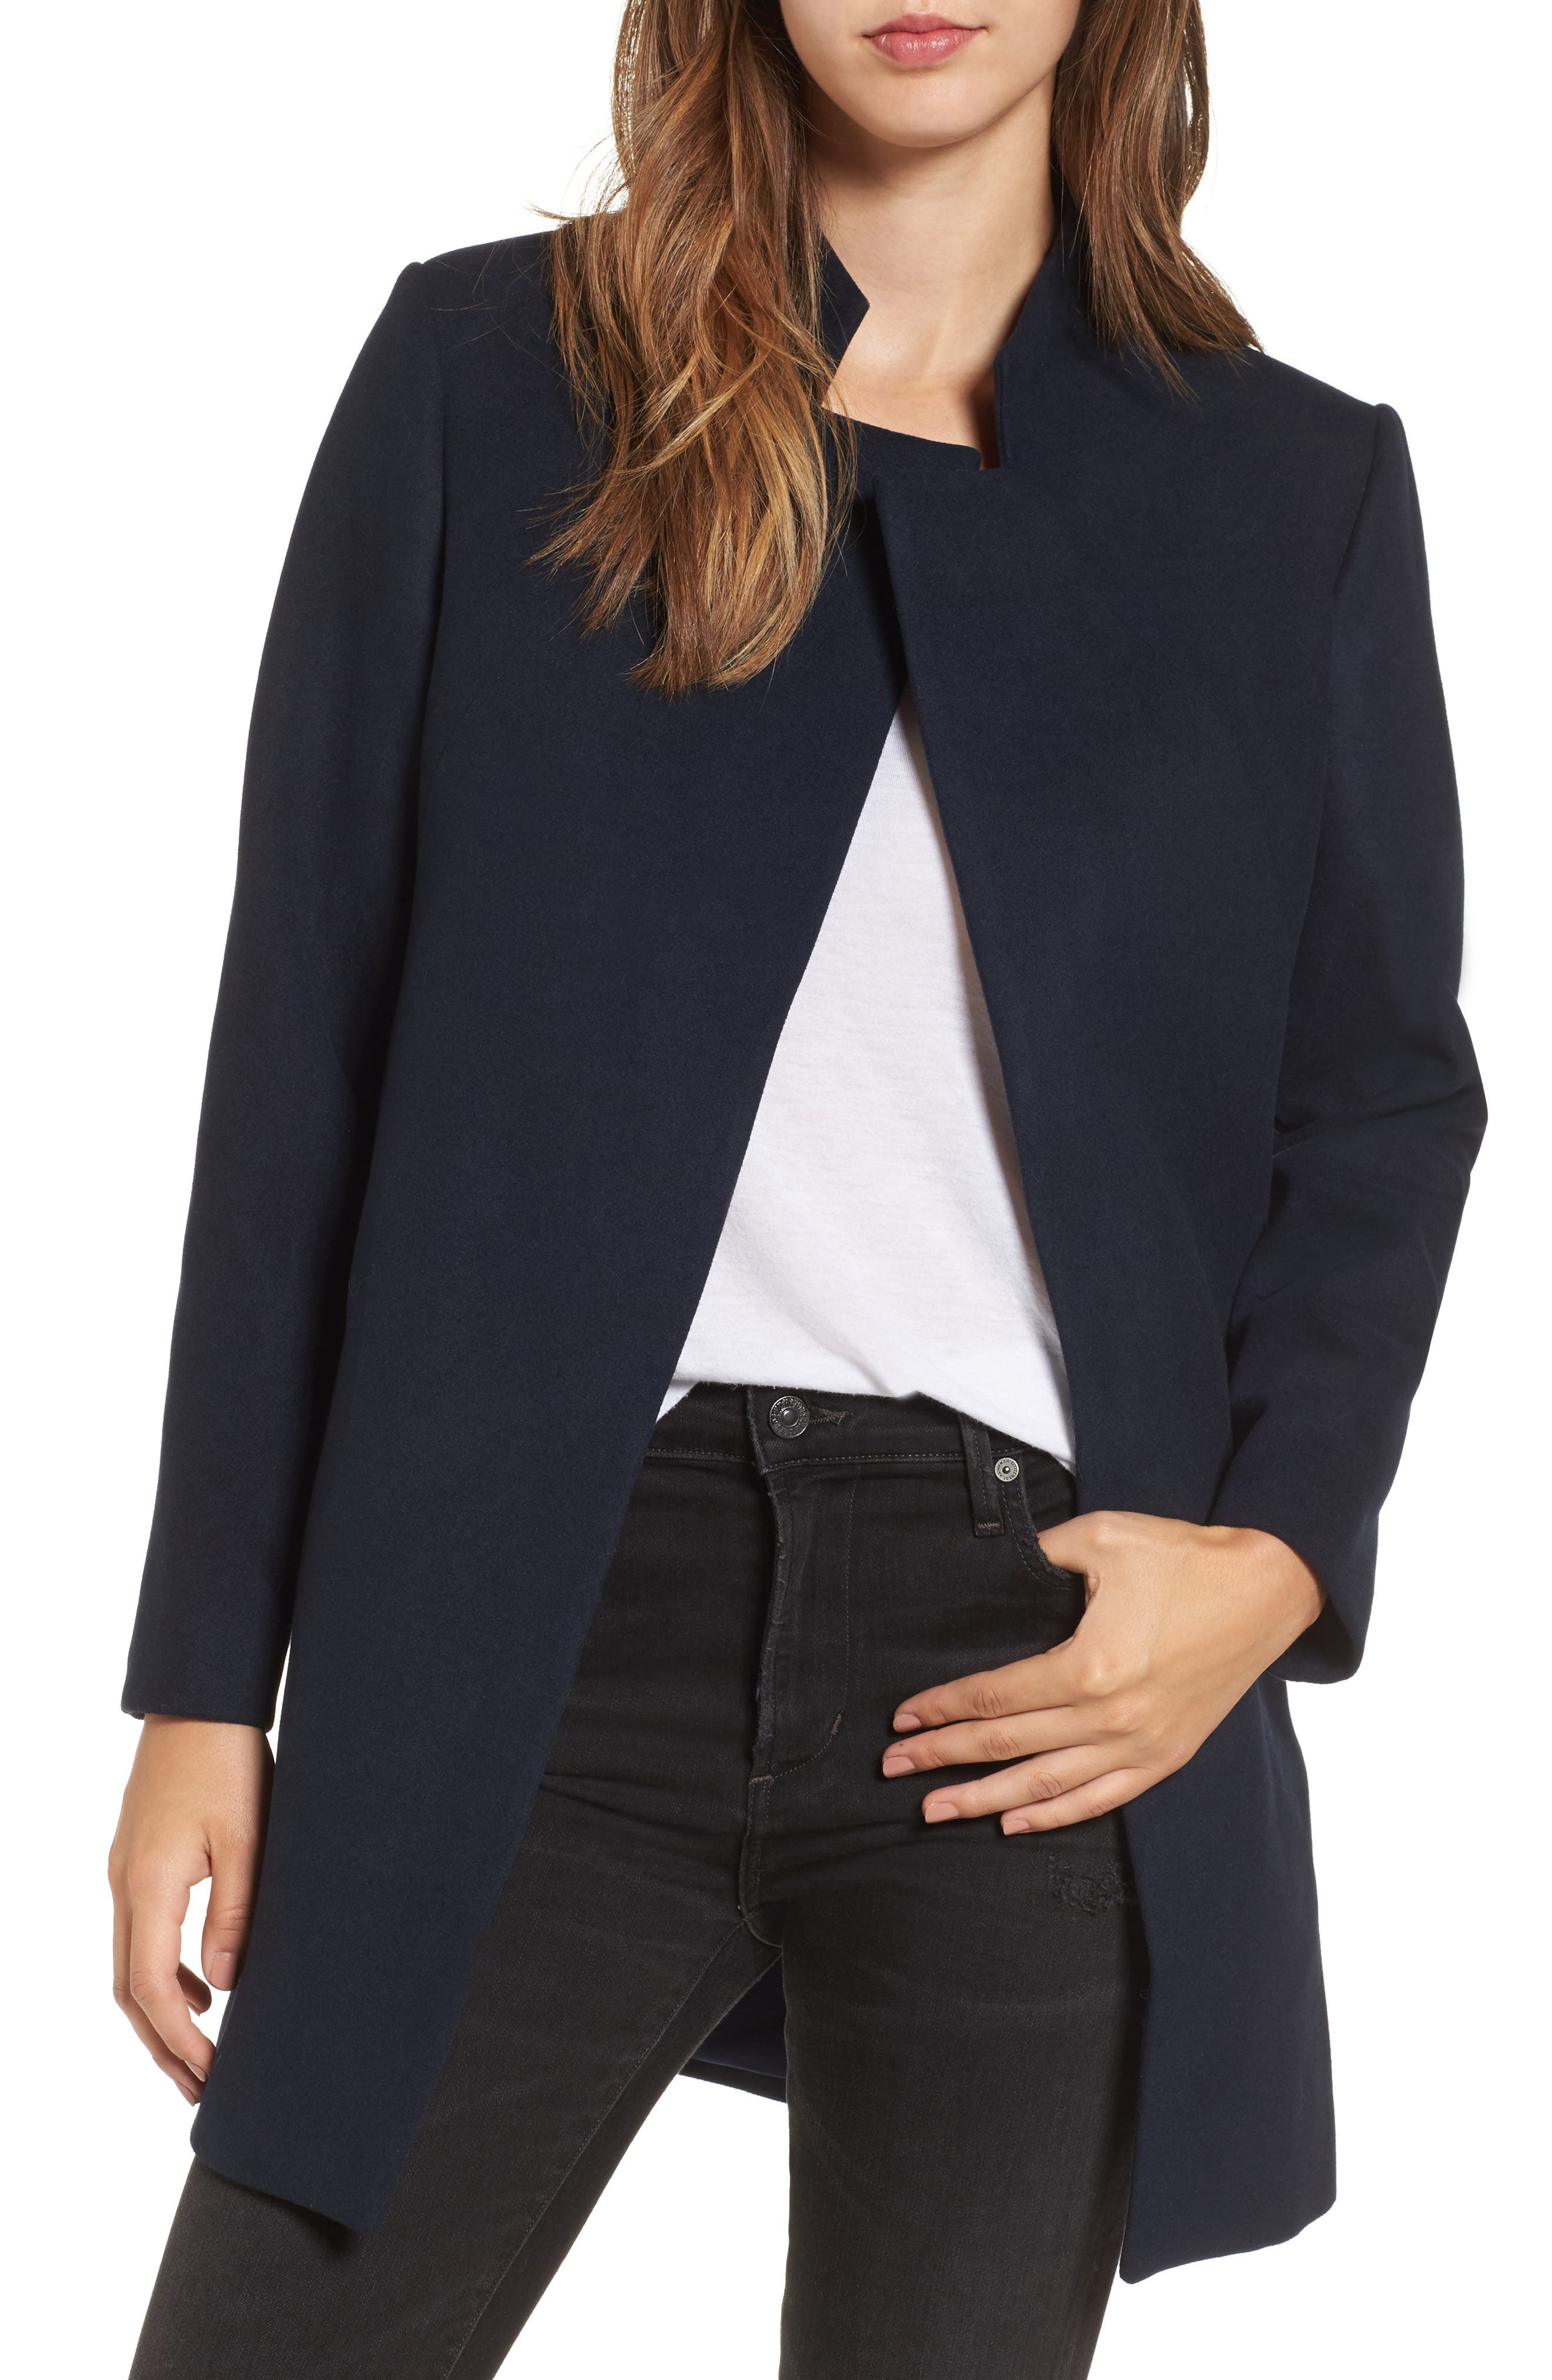 Dream Town Coat,                         Main,                         color, Navy